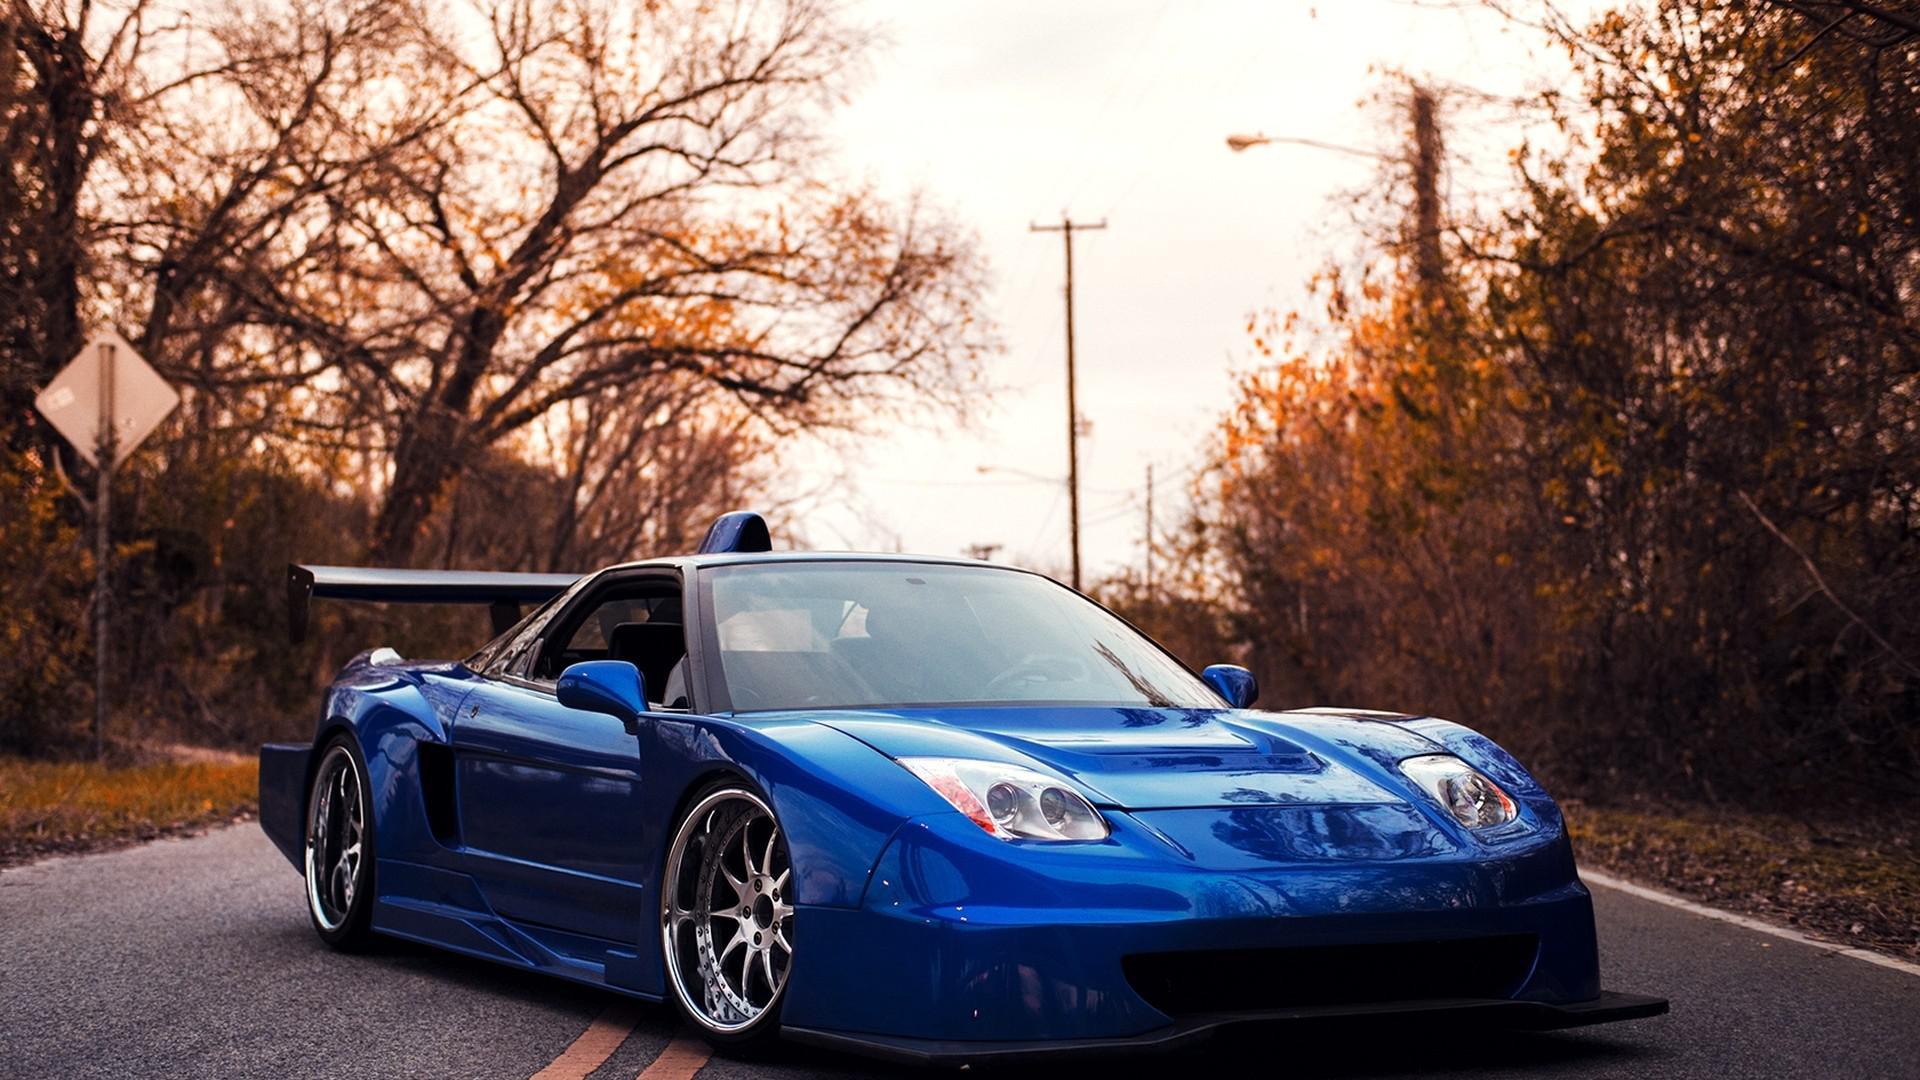 Laptop car wallpapers jdm · jdm phone wallpaper. Acura Nsx Tuning Jdm Blue Car Wallpaper Other Wallpaper Better